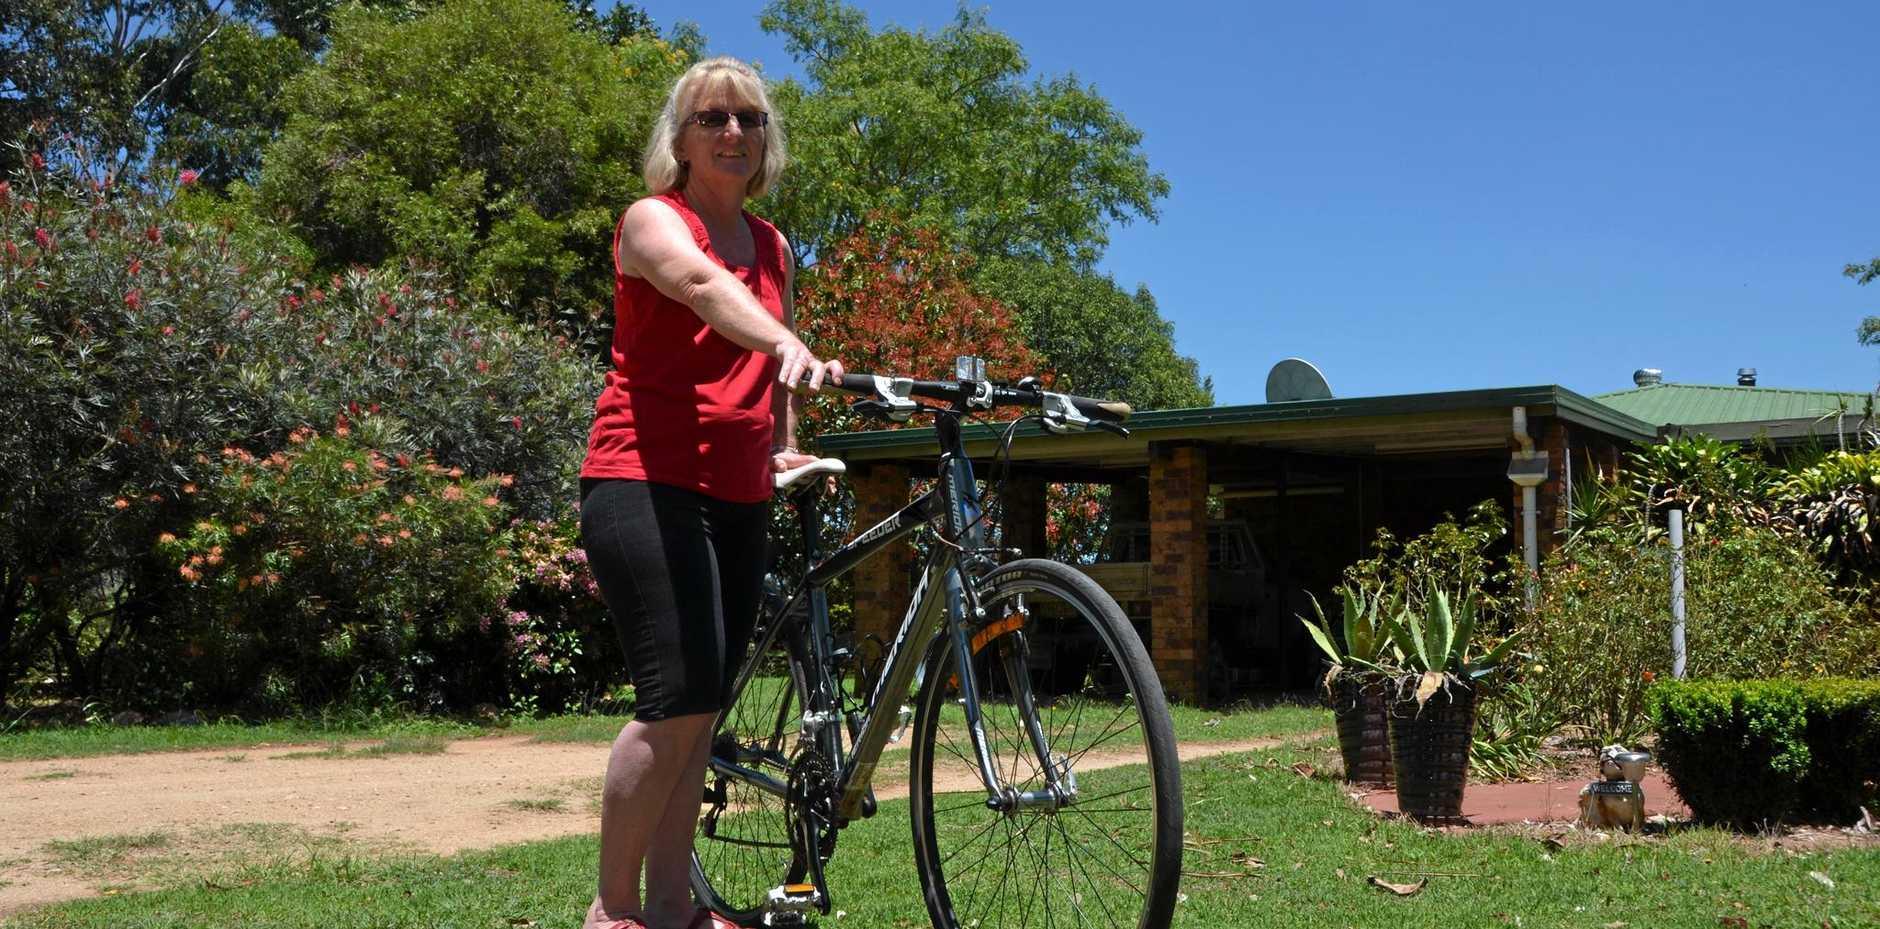 Josie Potter completed her seventh Brissie to Bay bike ride on Sunday.